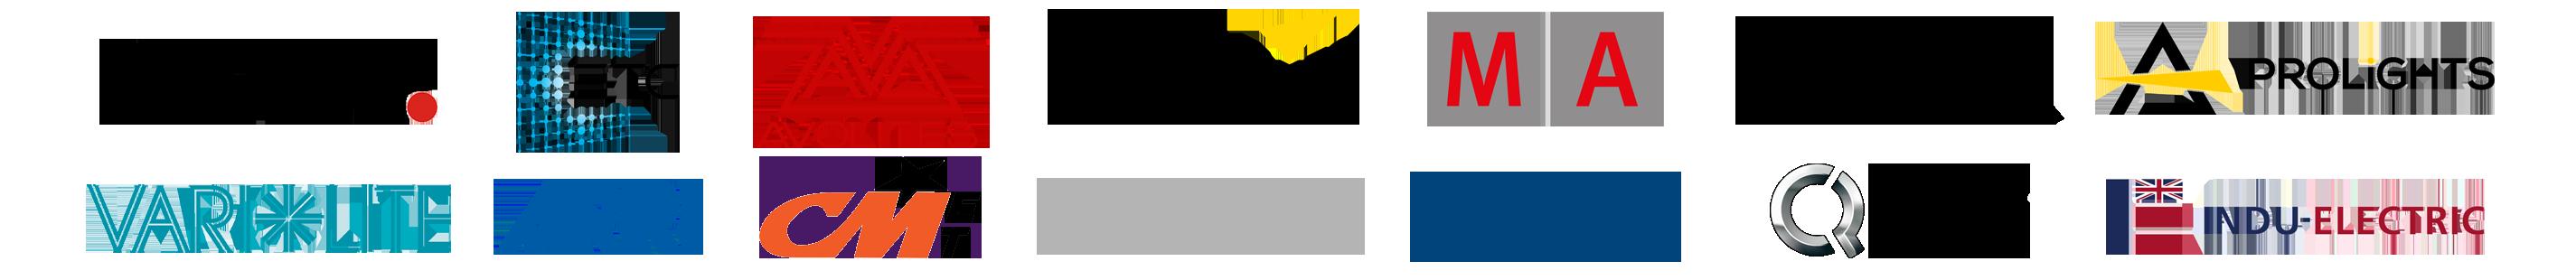 Storm Ltd Equipment Manufacturers